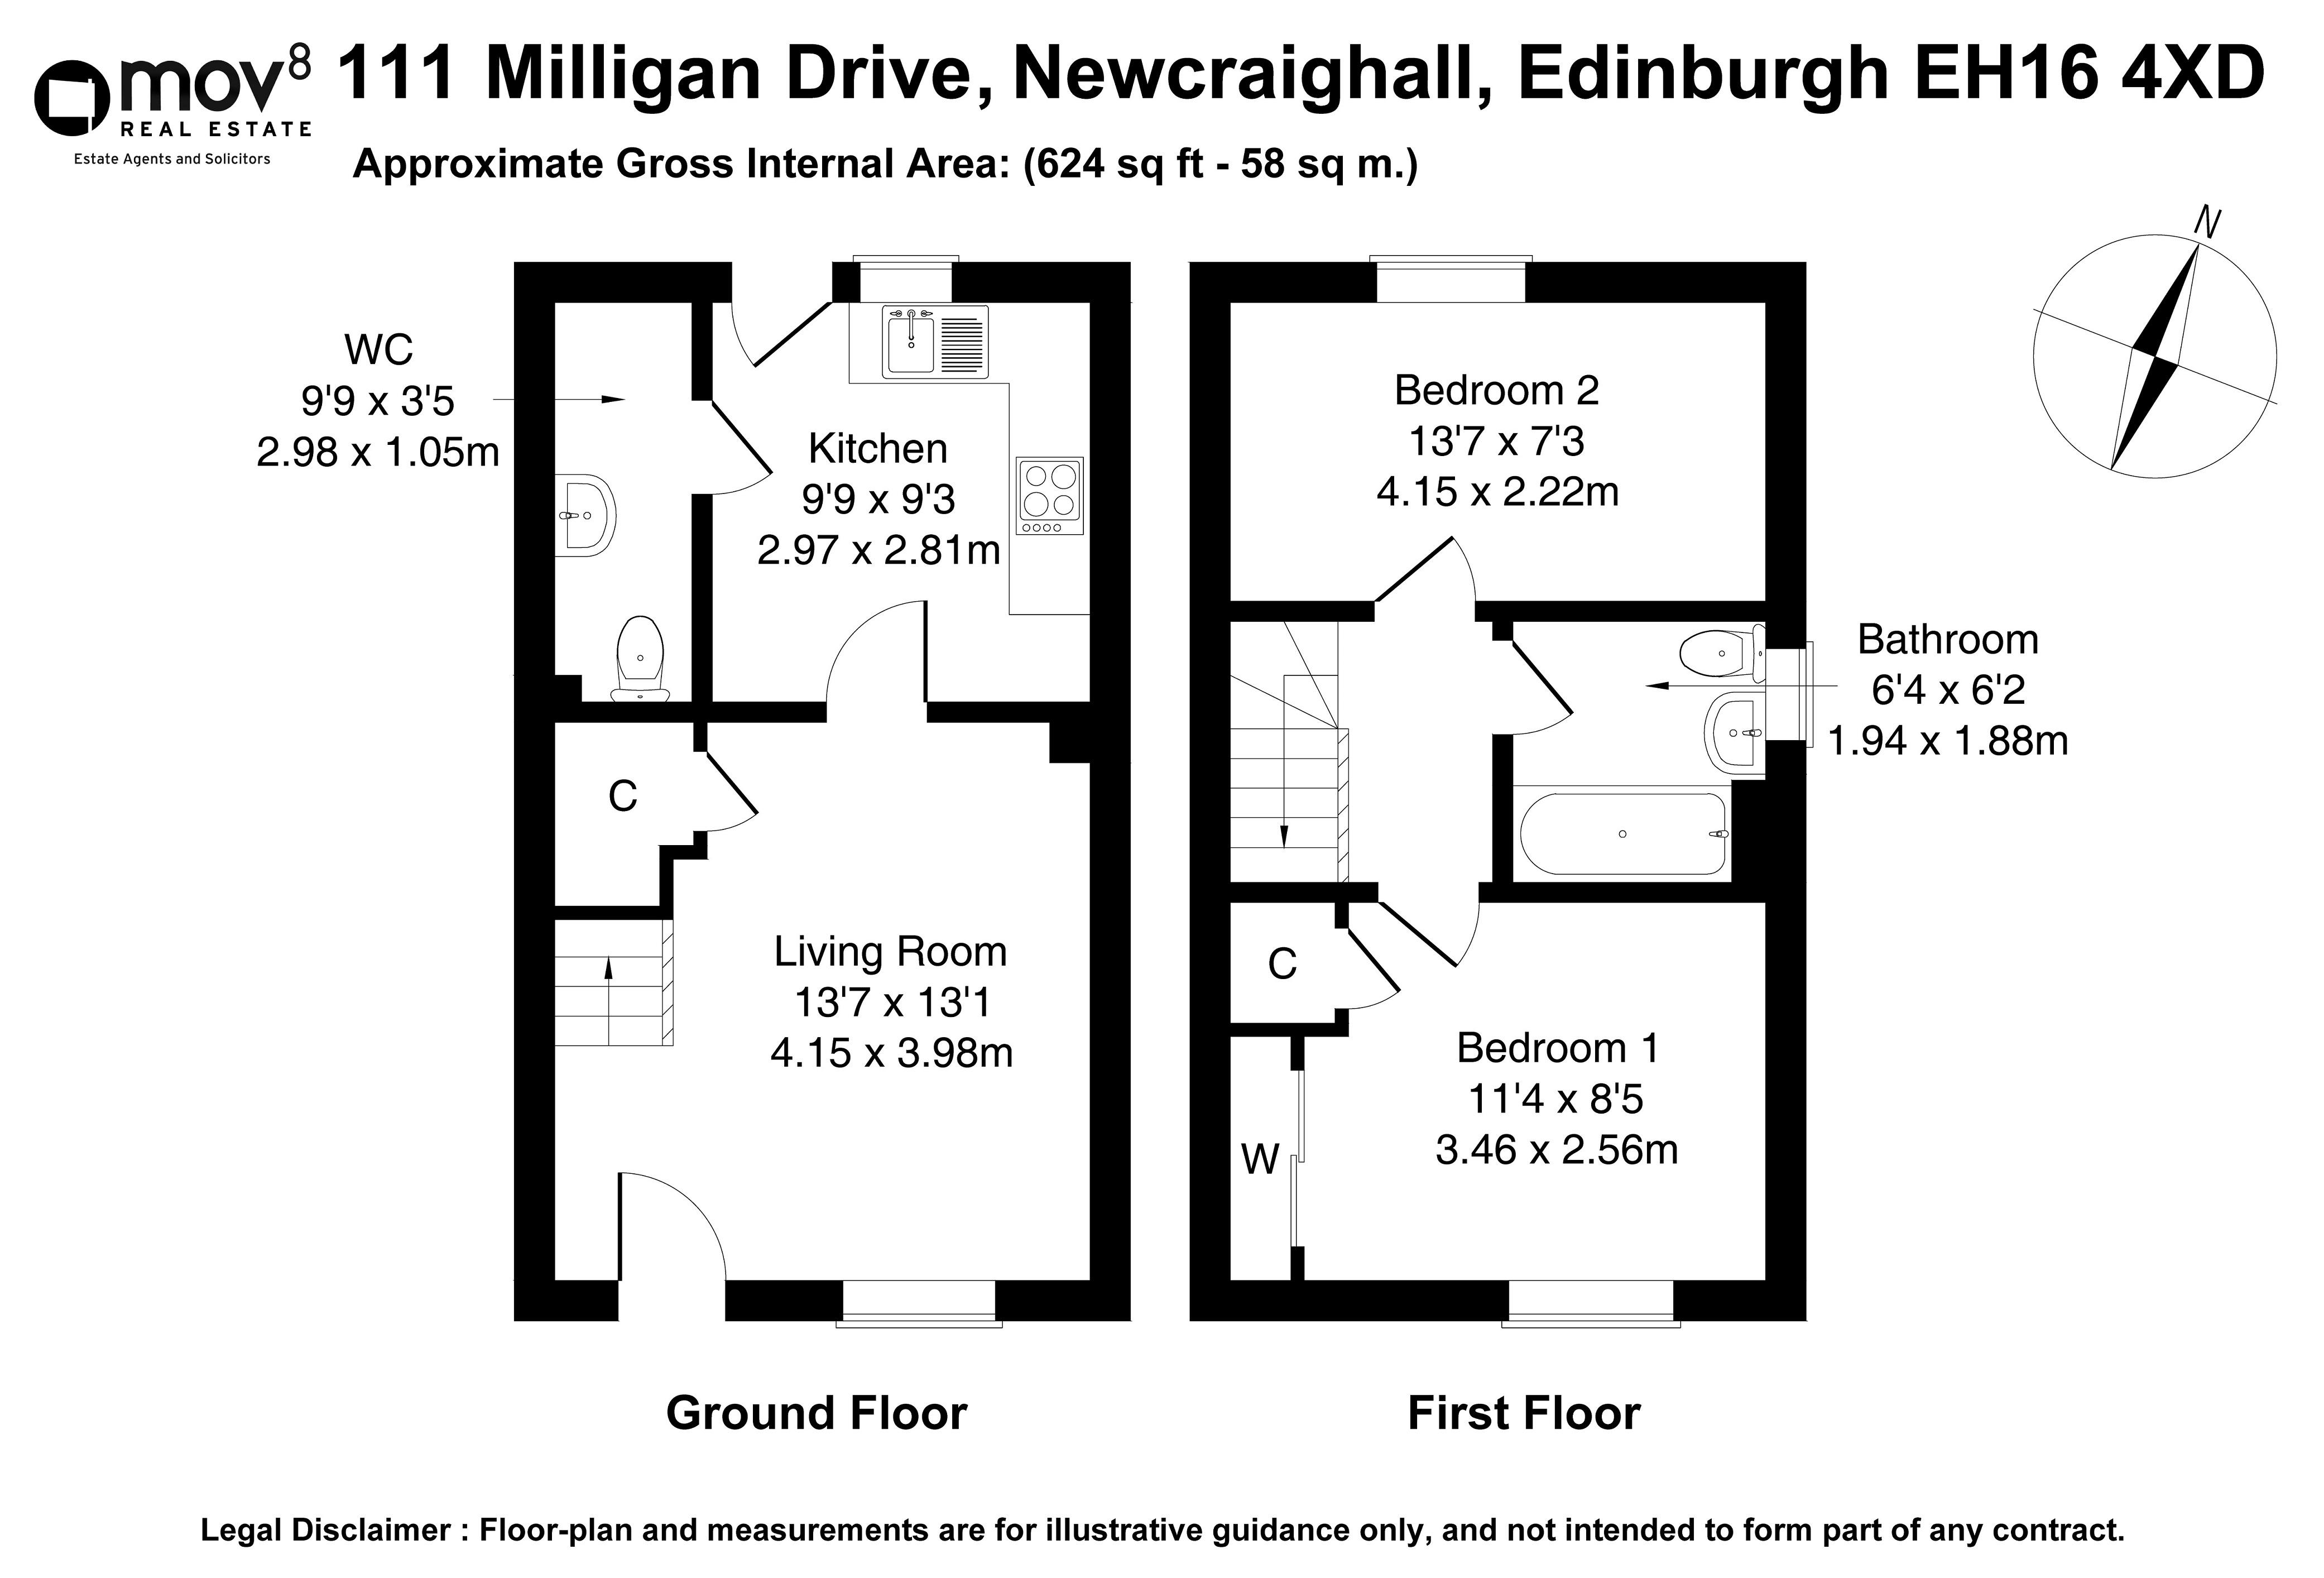 Floorplan 1 of 111 Milligan Drive, Newcraighall, Edinburgh, EH16 4XD